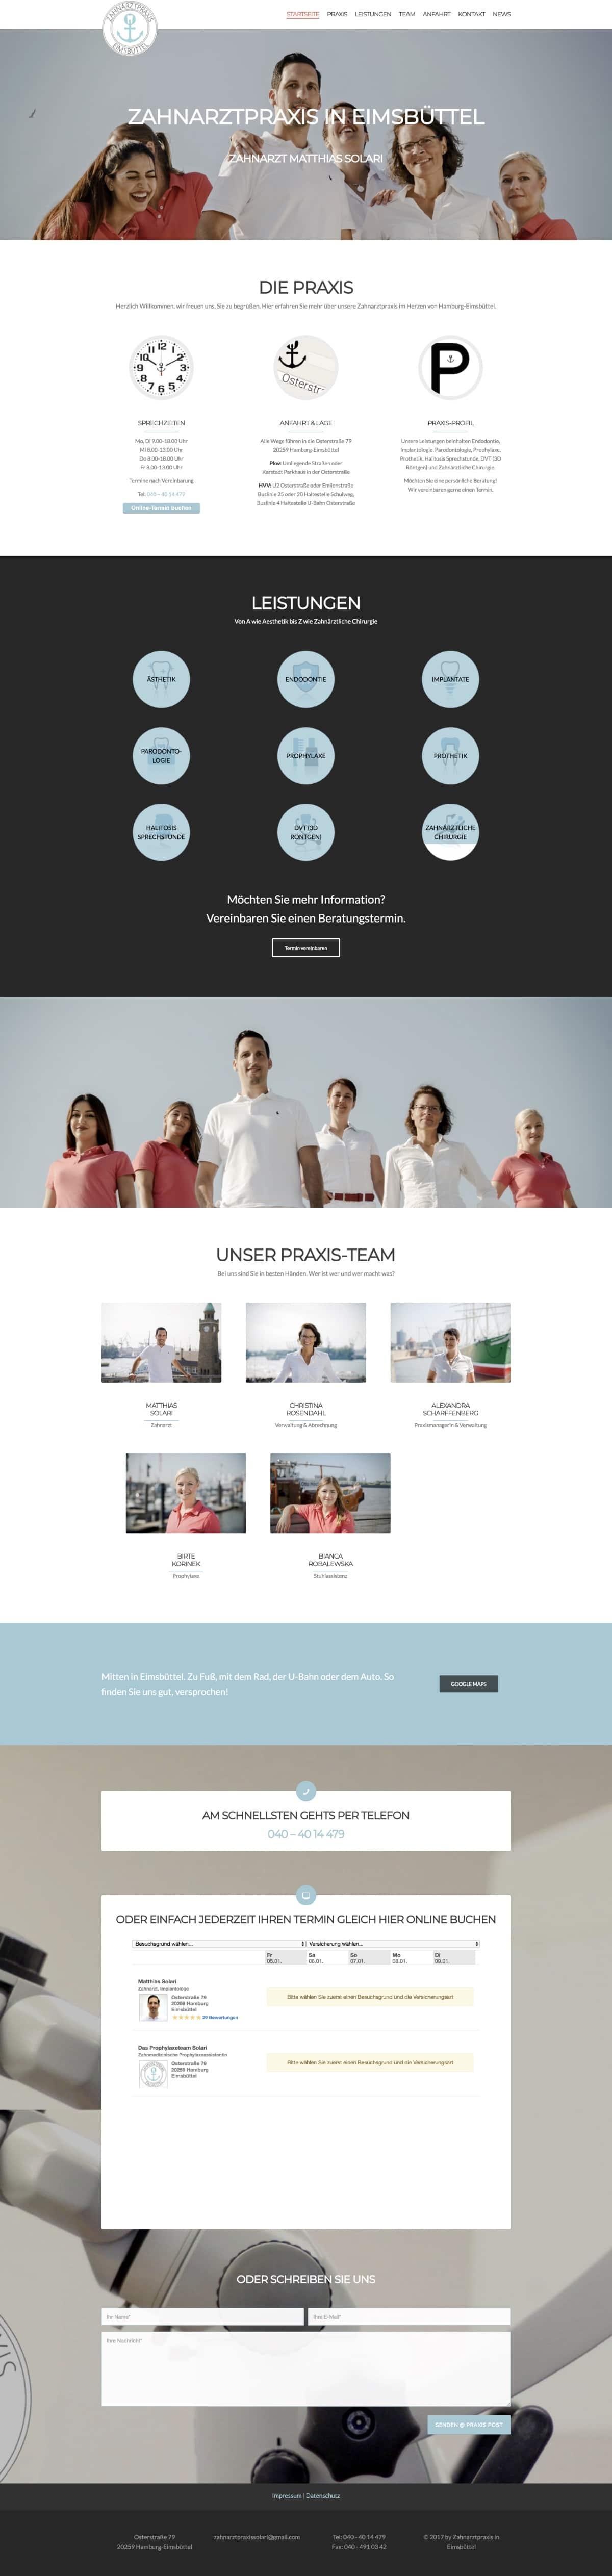 Website Zahnarztpraxis in Eimsbüttel